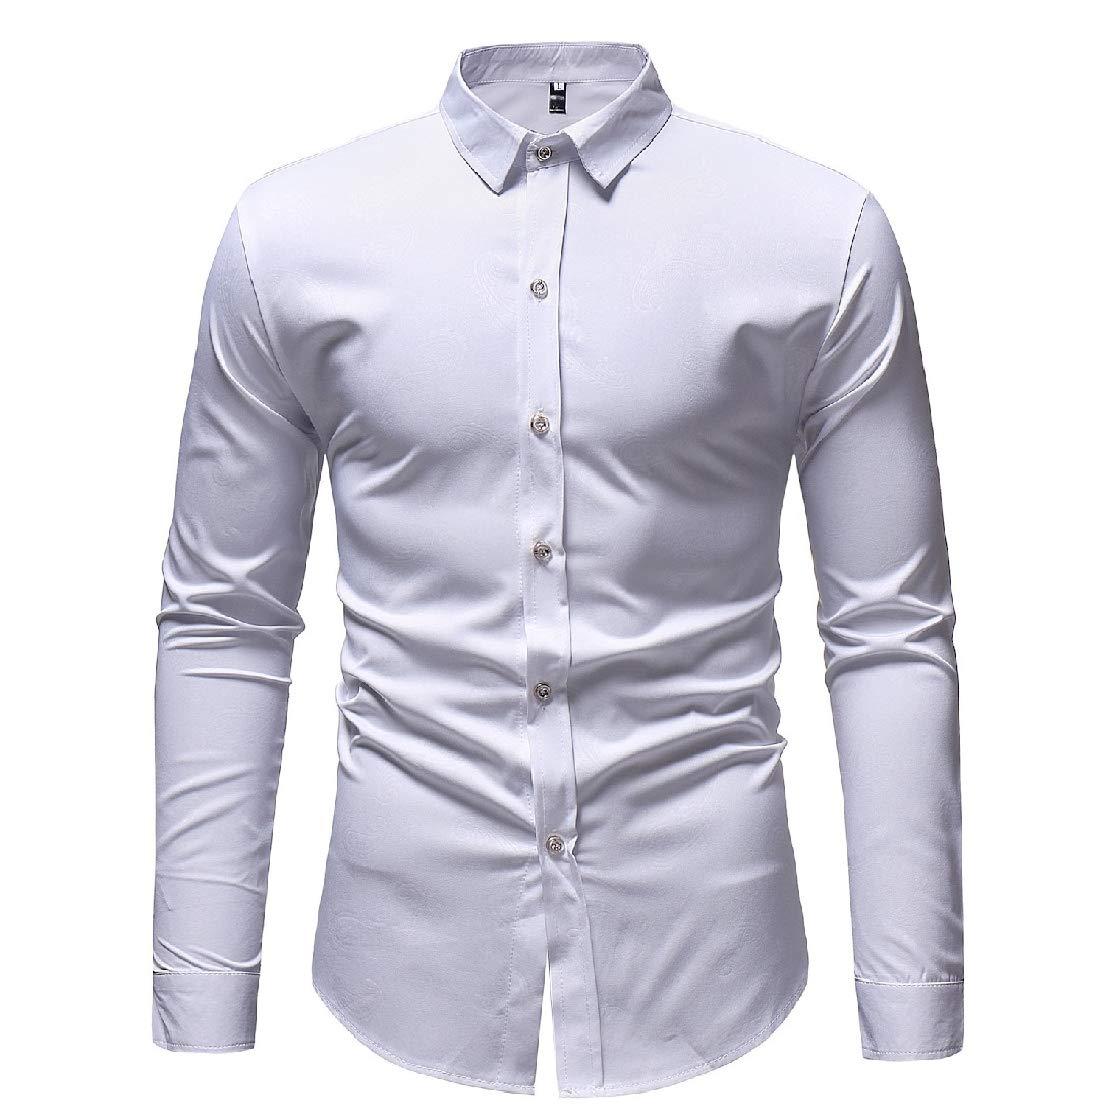 YUNY Men Turn Down Collar Dark Floral Casual Long Sleeve Cardigan Shirt White M